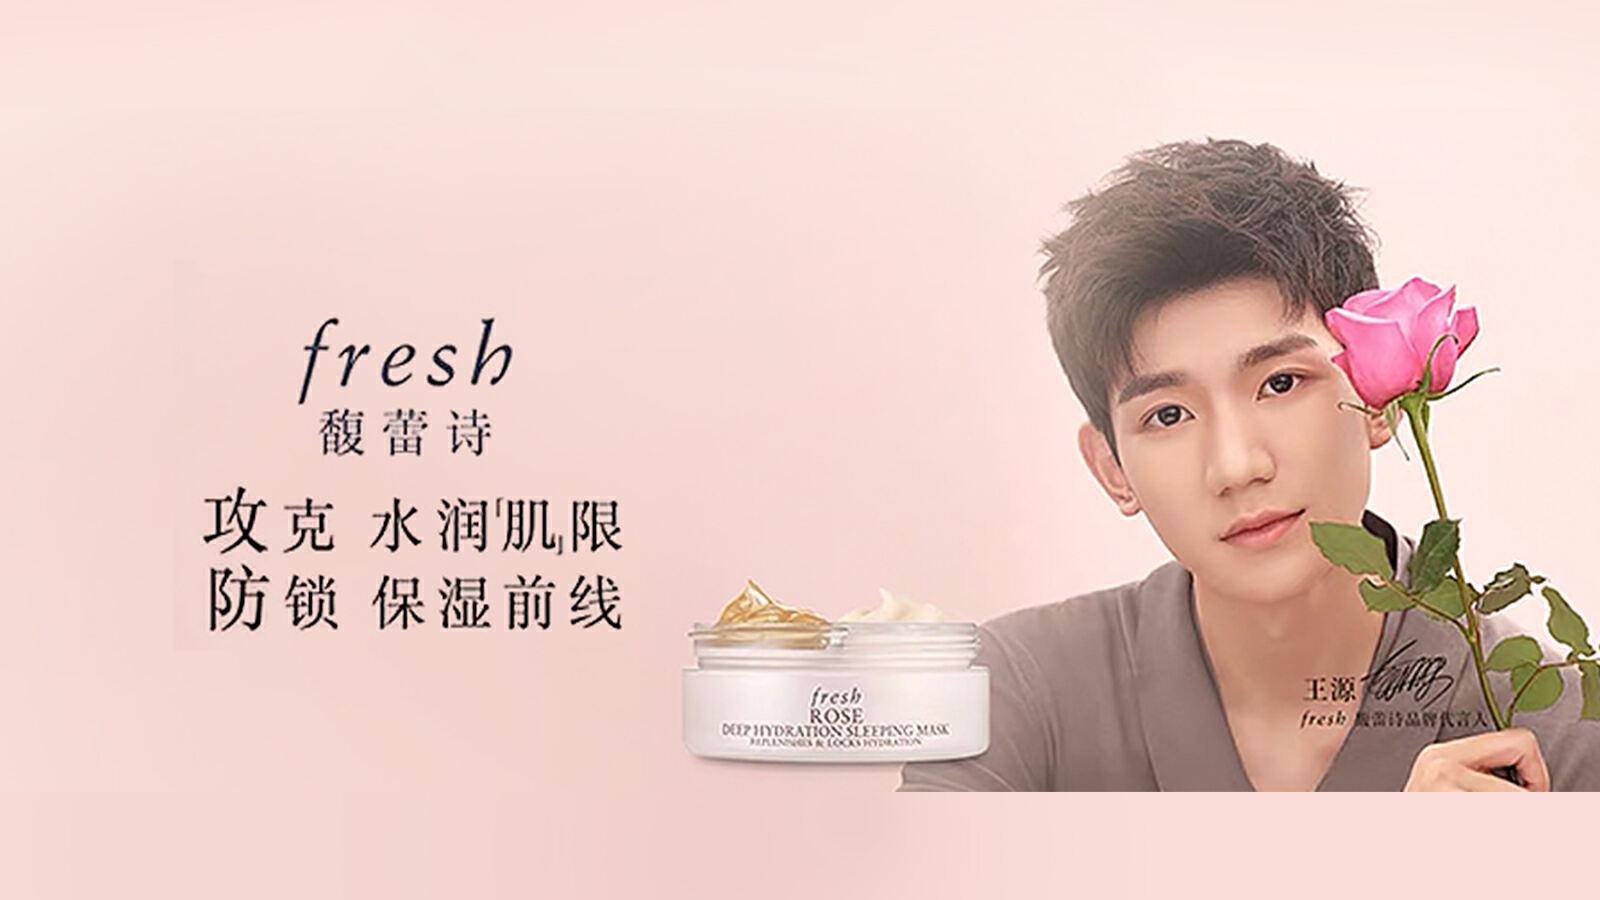 fresh× 美图 王源同款贴纸,爱豆同框互动